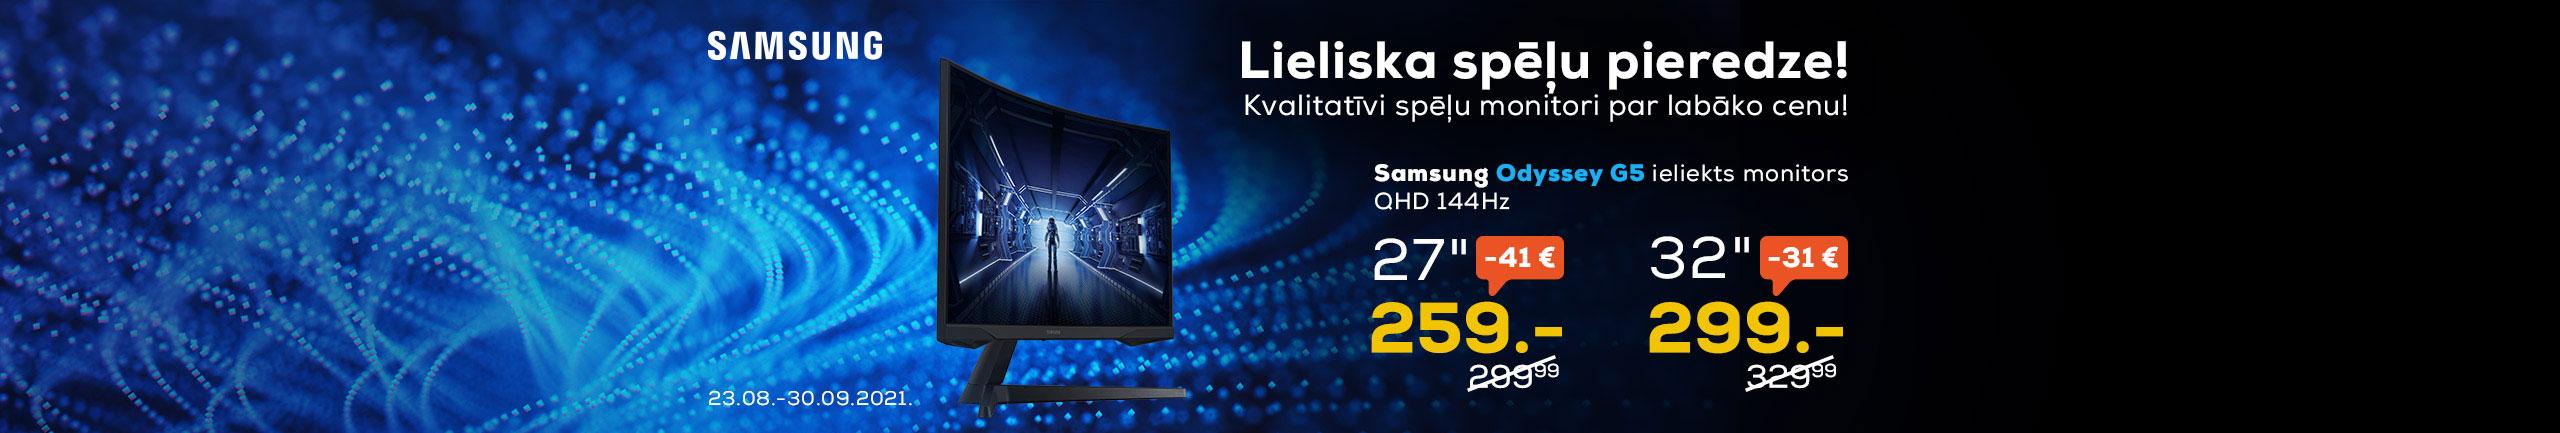 PL Samsung Odyssey G5